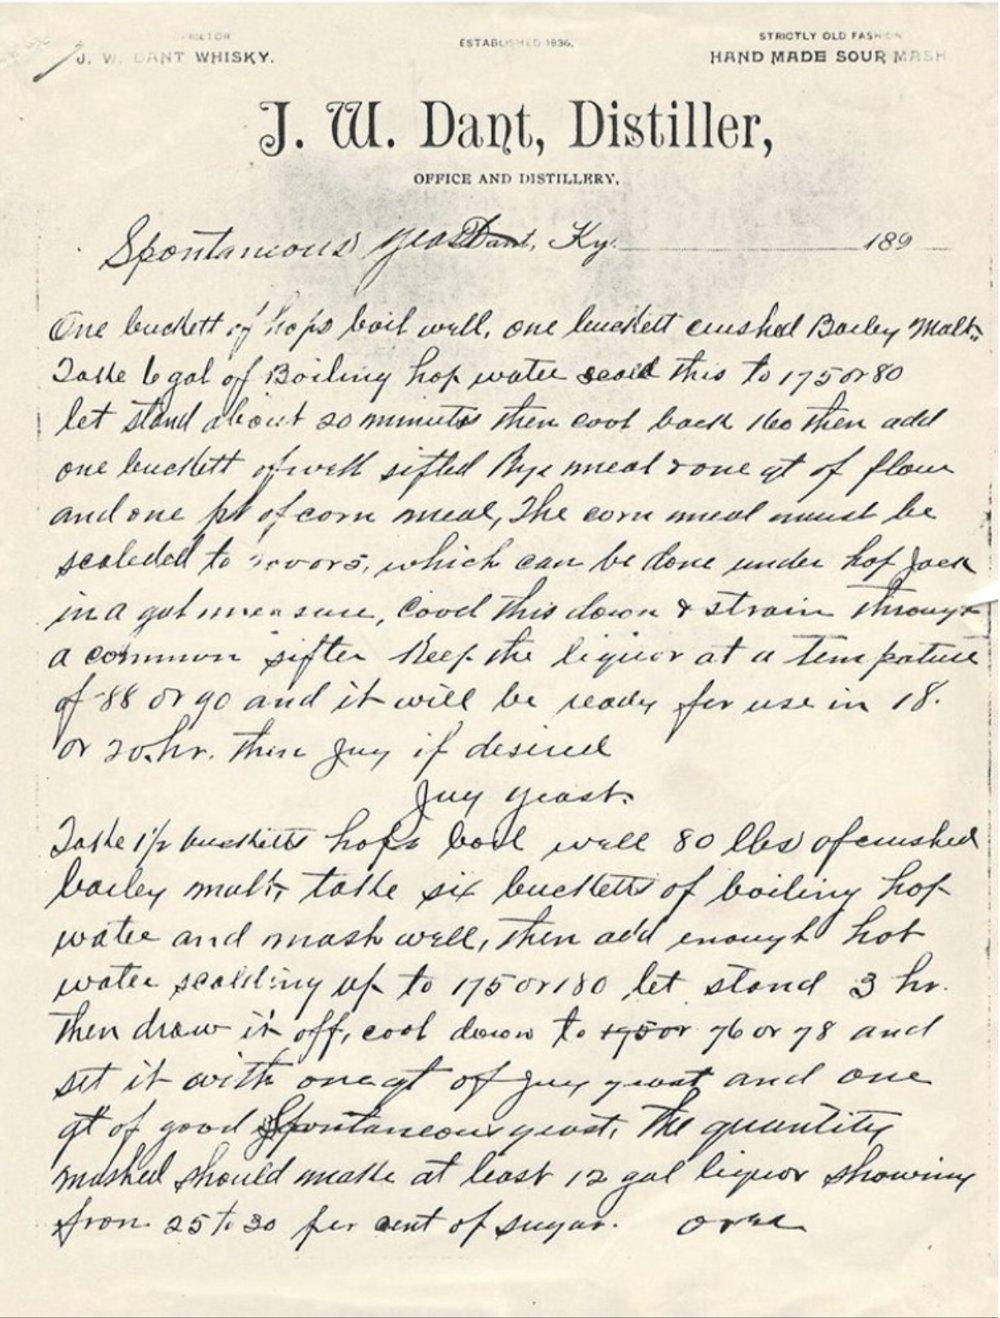 Hand written yeast recipes from J.W. Dent around 1890.